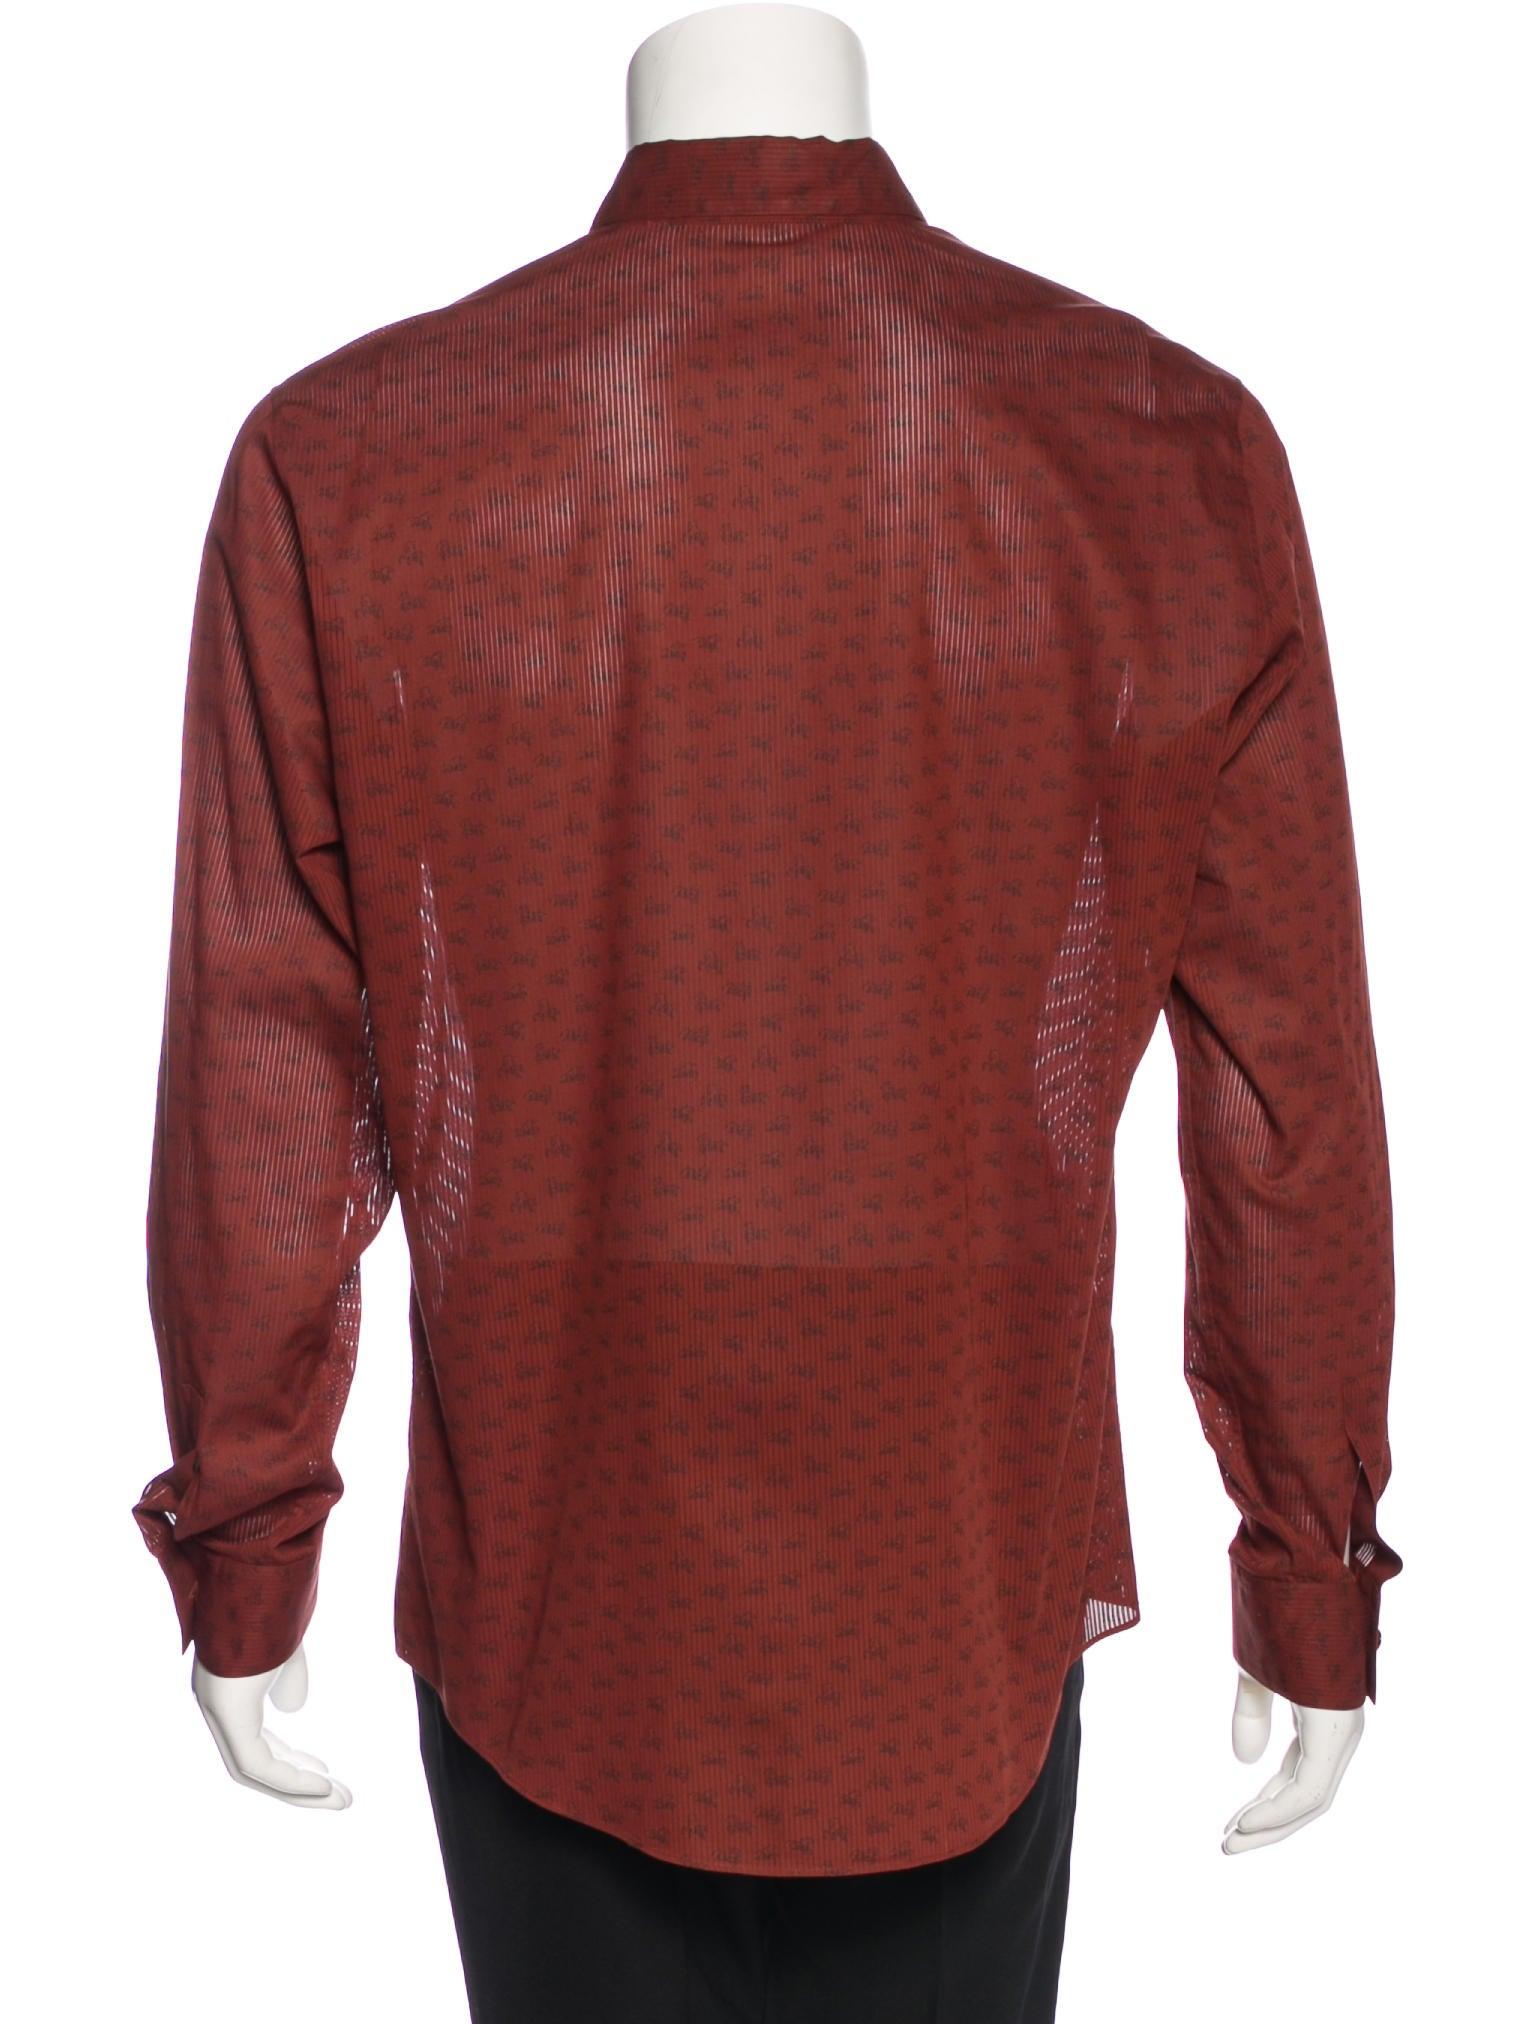 Equestrian print clothing